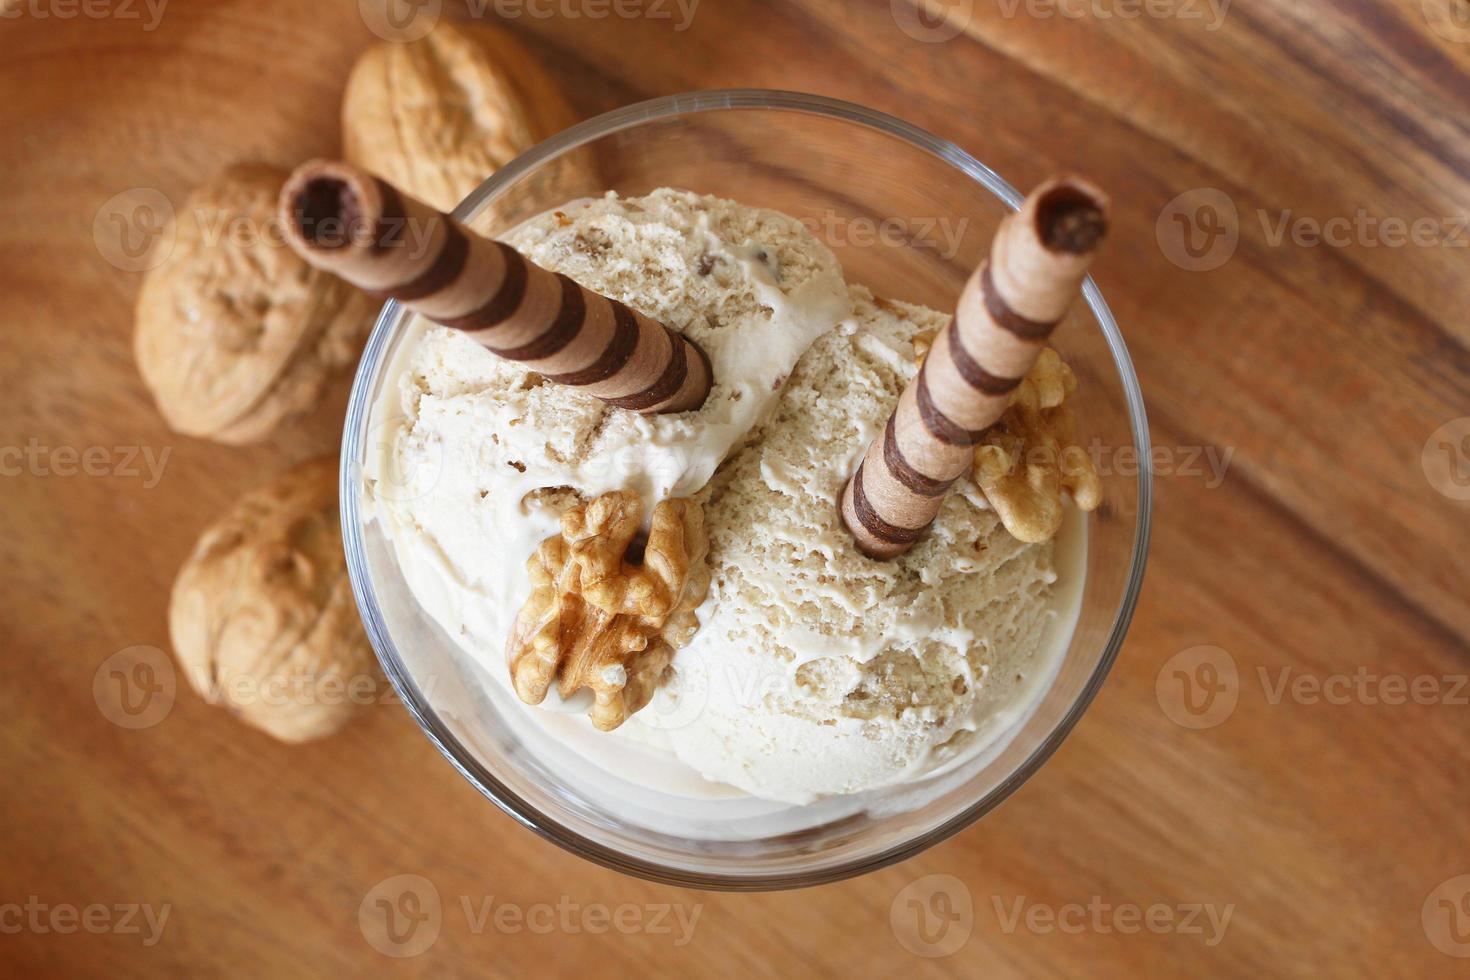 walnotenijs dessert met chocolade wafels foto